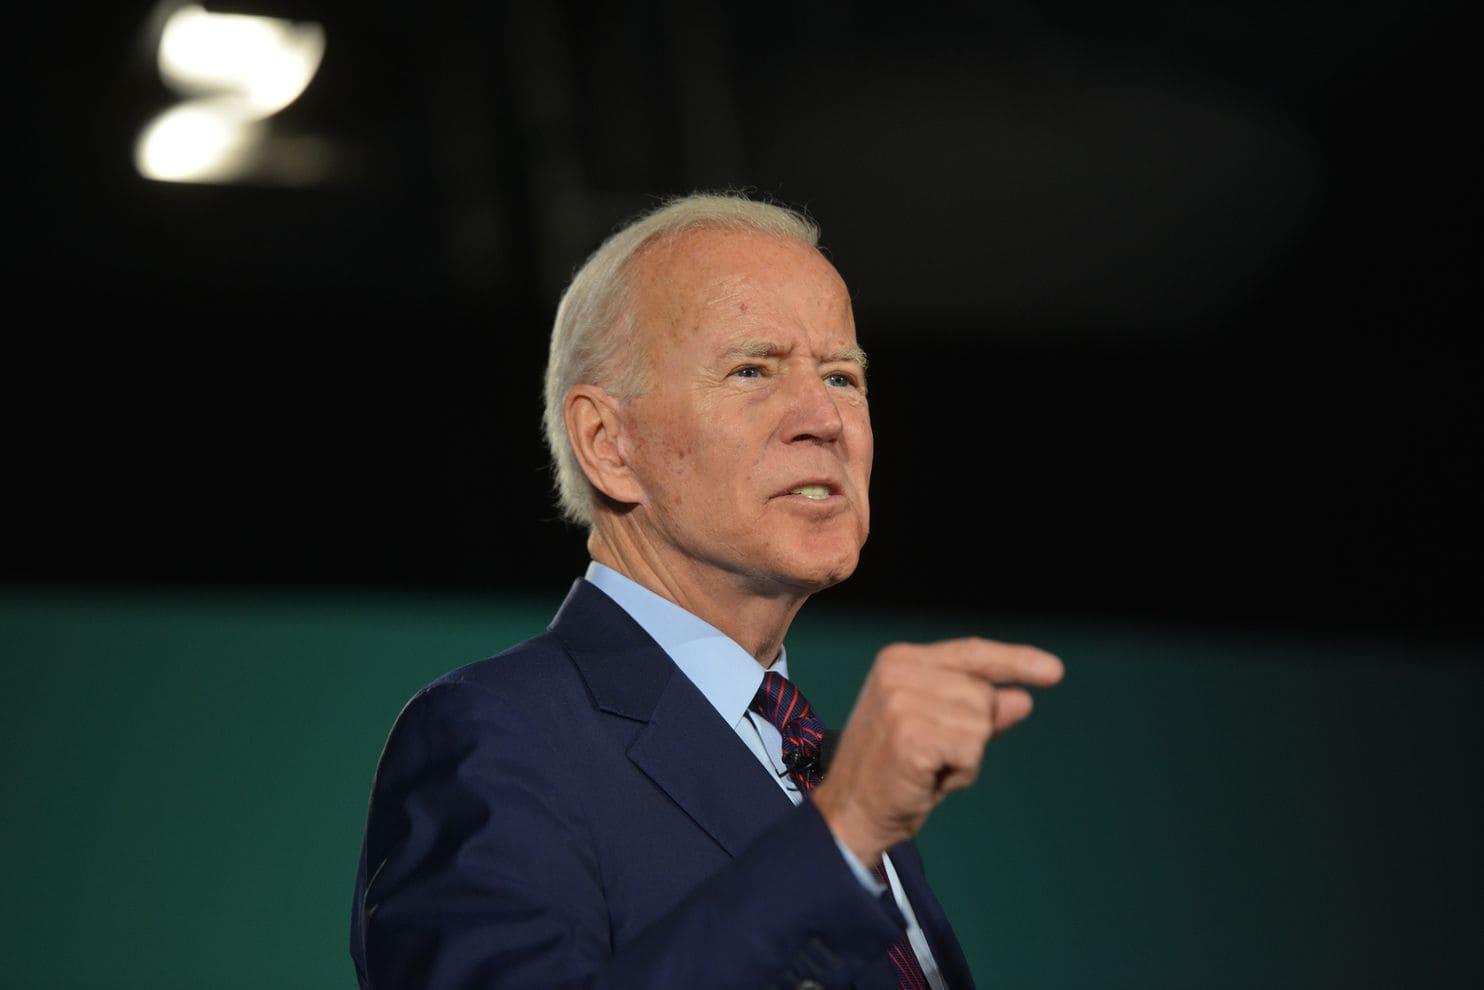 Joe Biden: Trump Is The Ambassador Of White Supremacist In The US